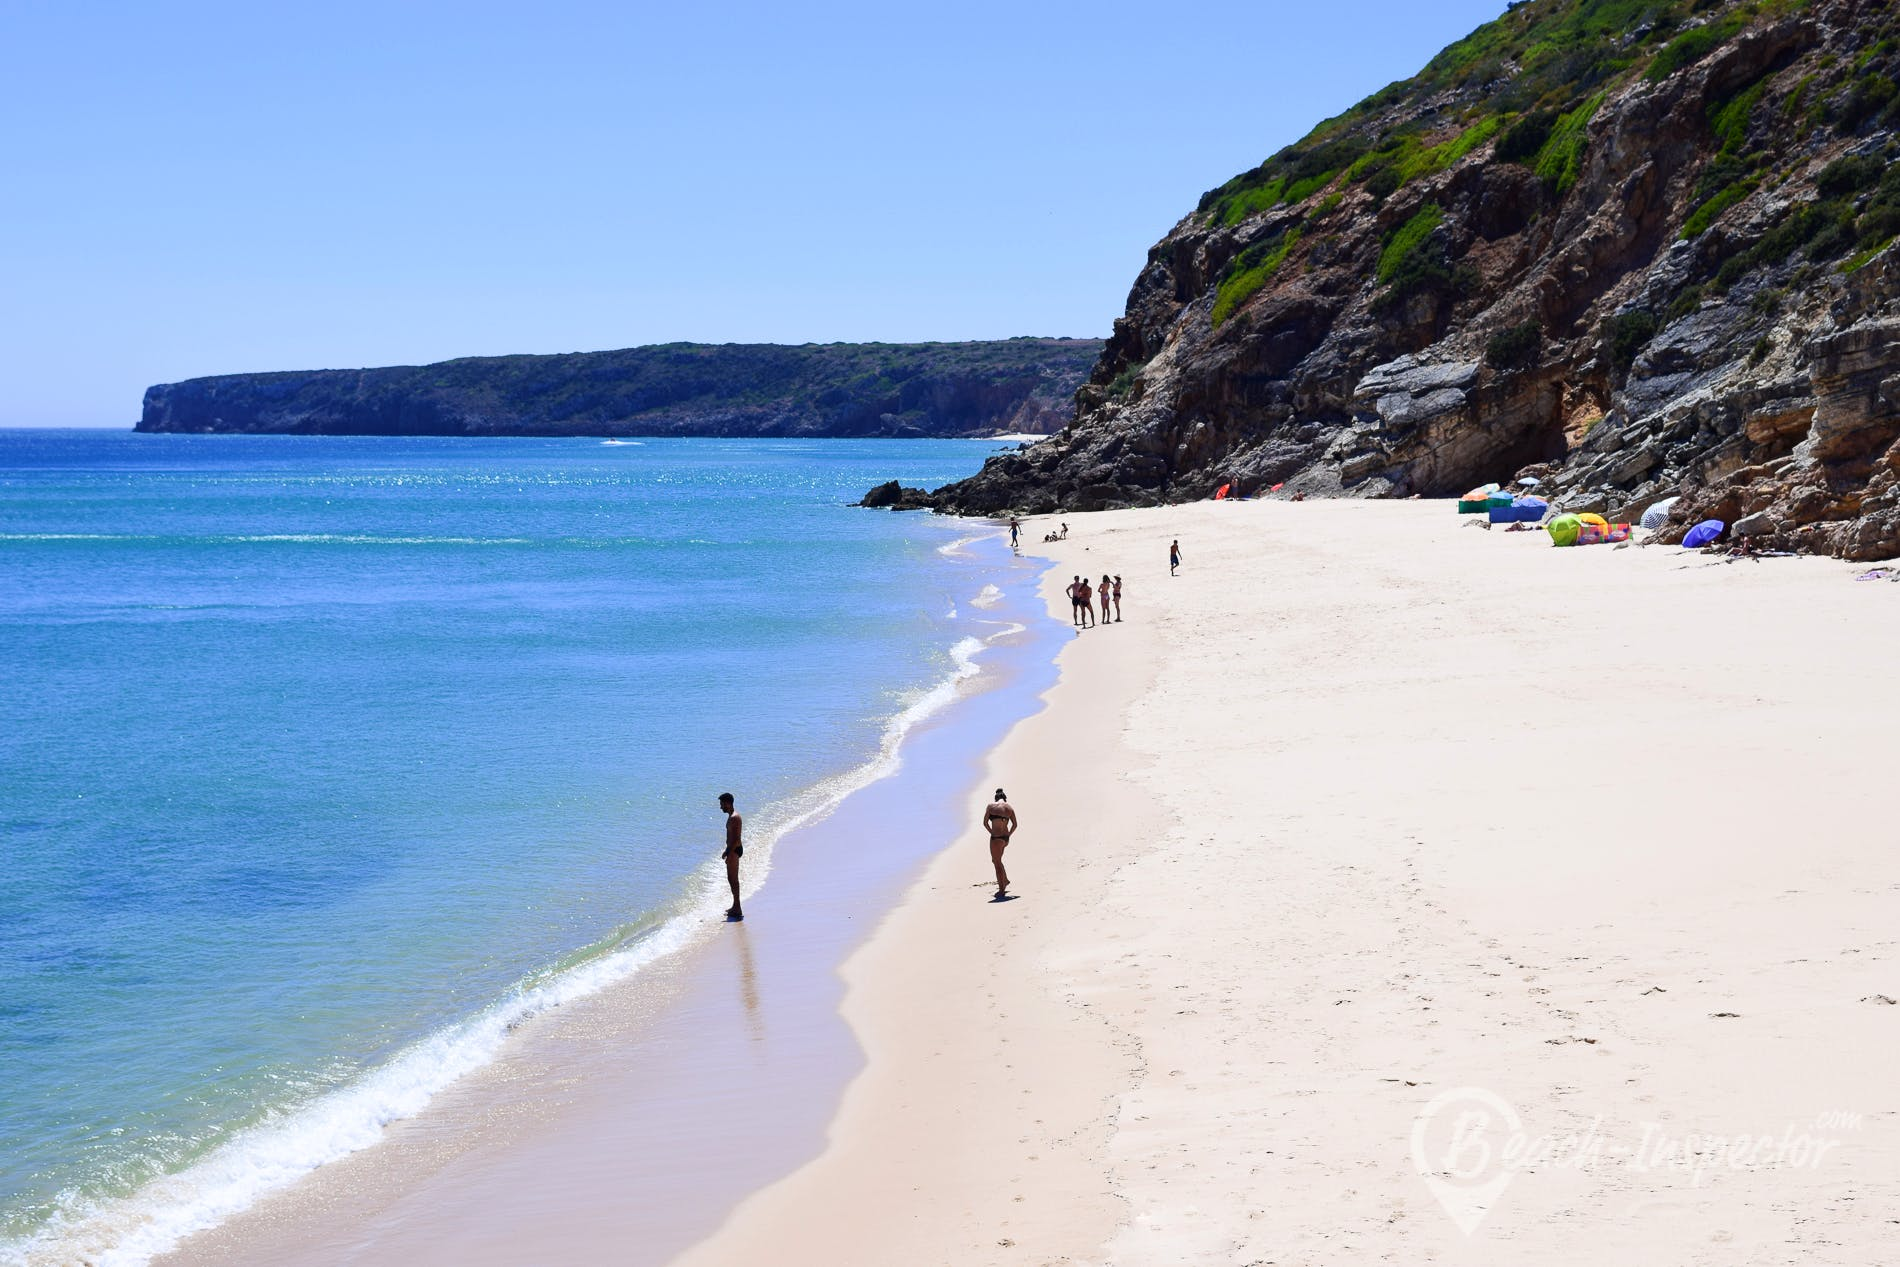 Strand Praia da Figueira, Algarve, Portugal